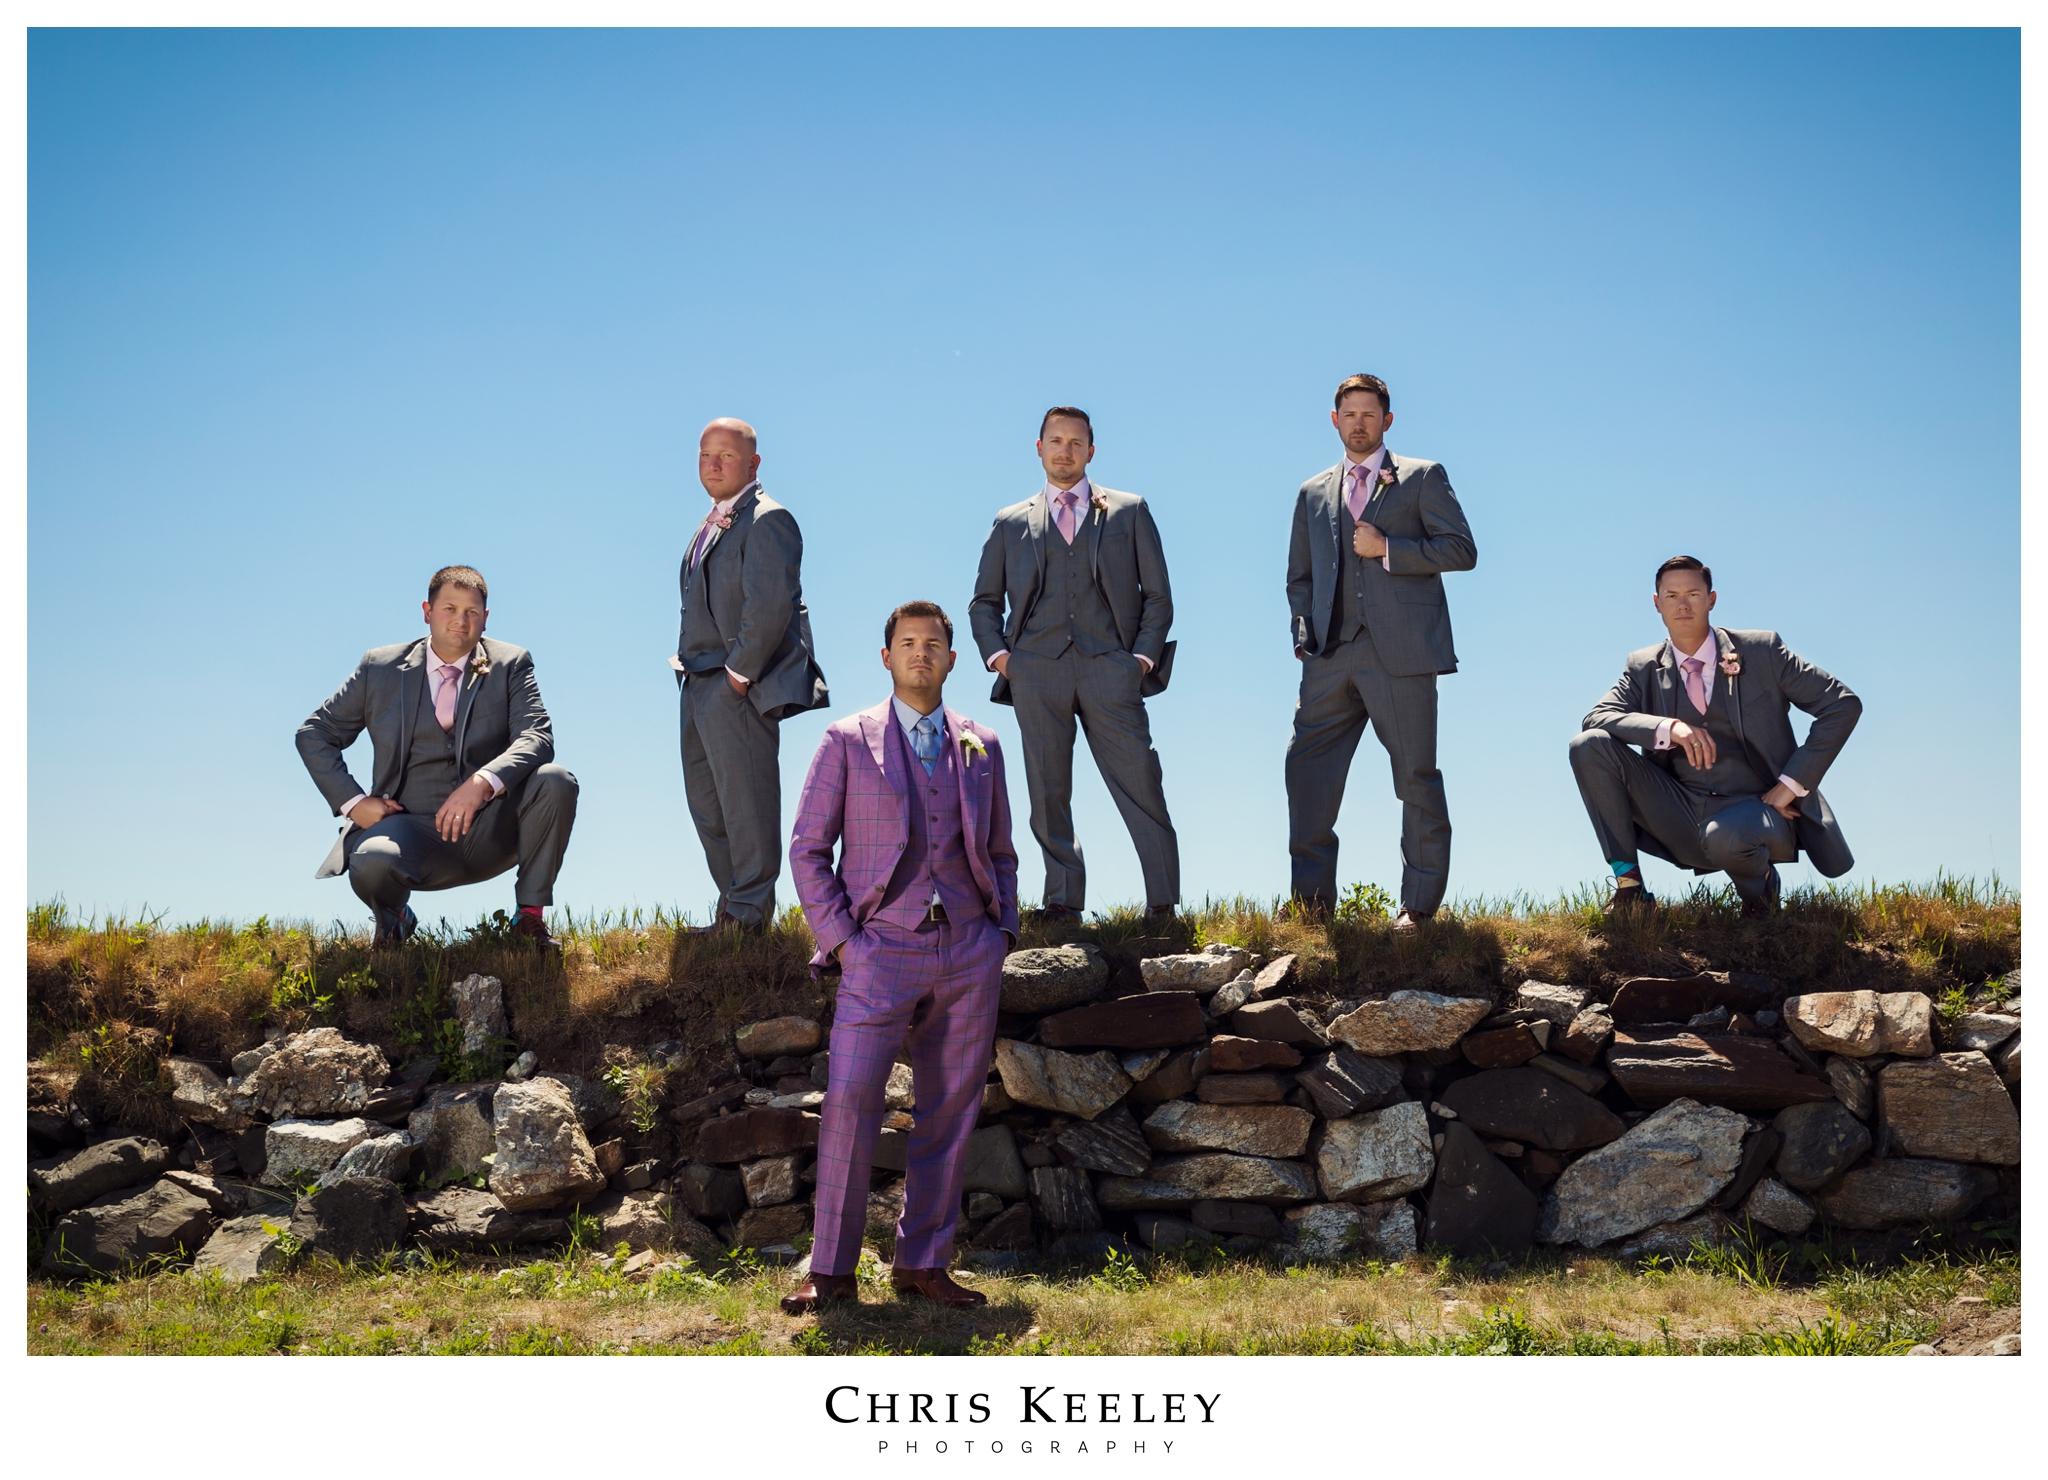 epic-groomsmen-portrait.jpg